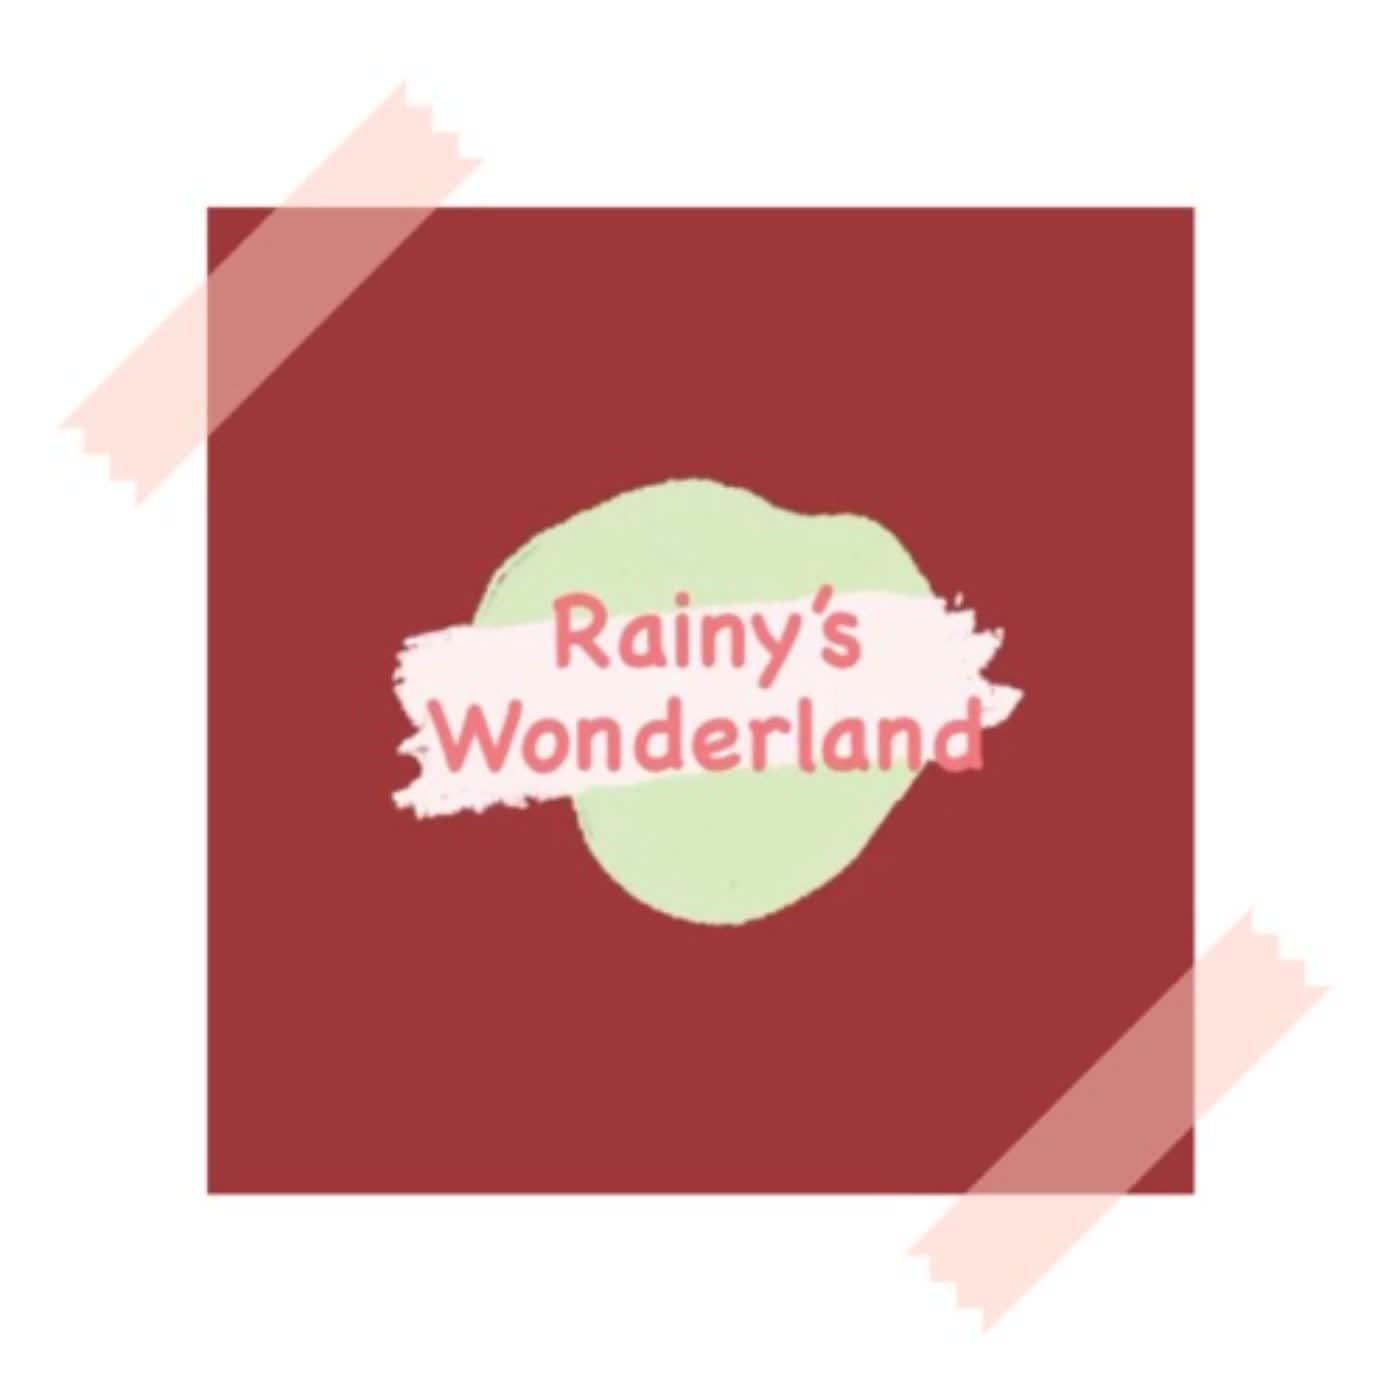 Rainy's Wonderland